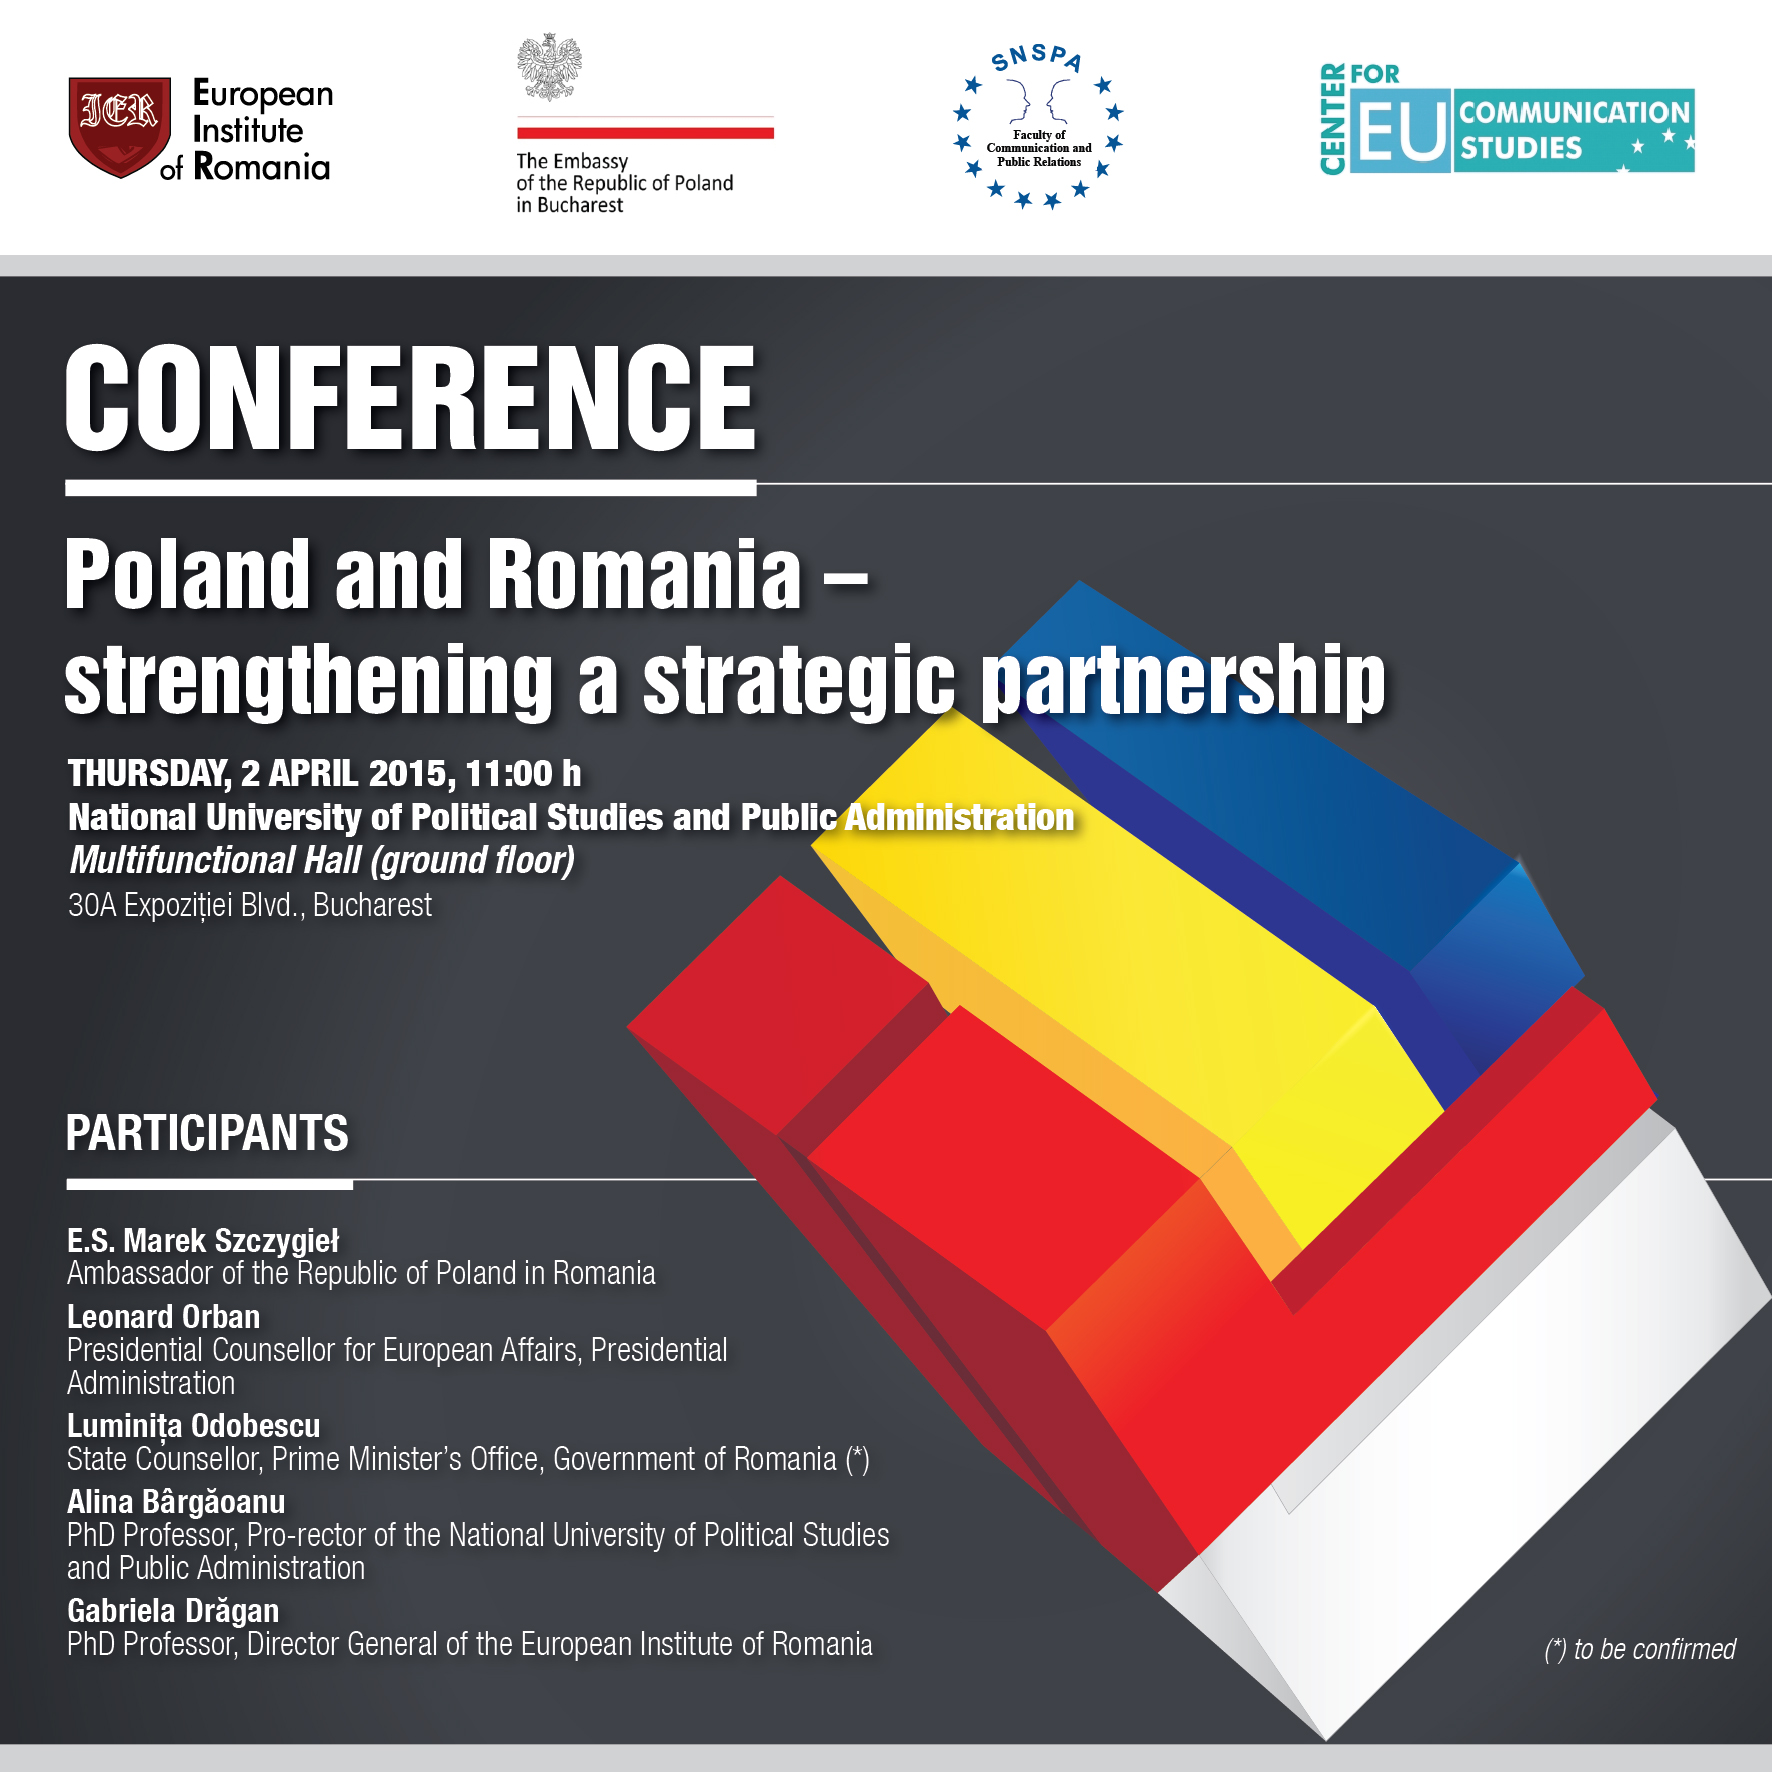 Poland and Romania - strengthening a strategic partnership